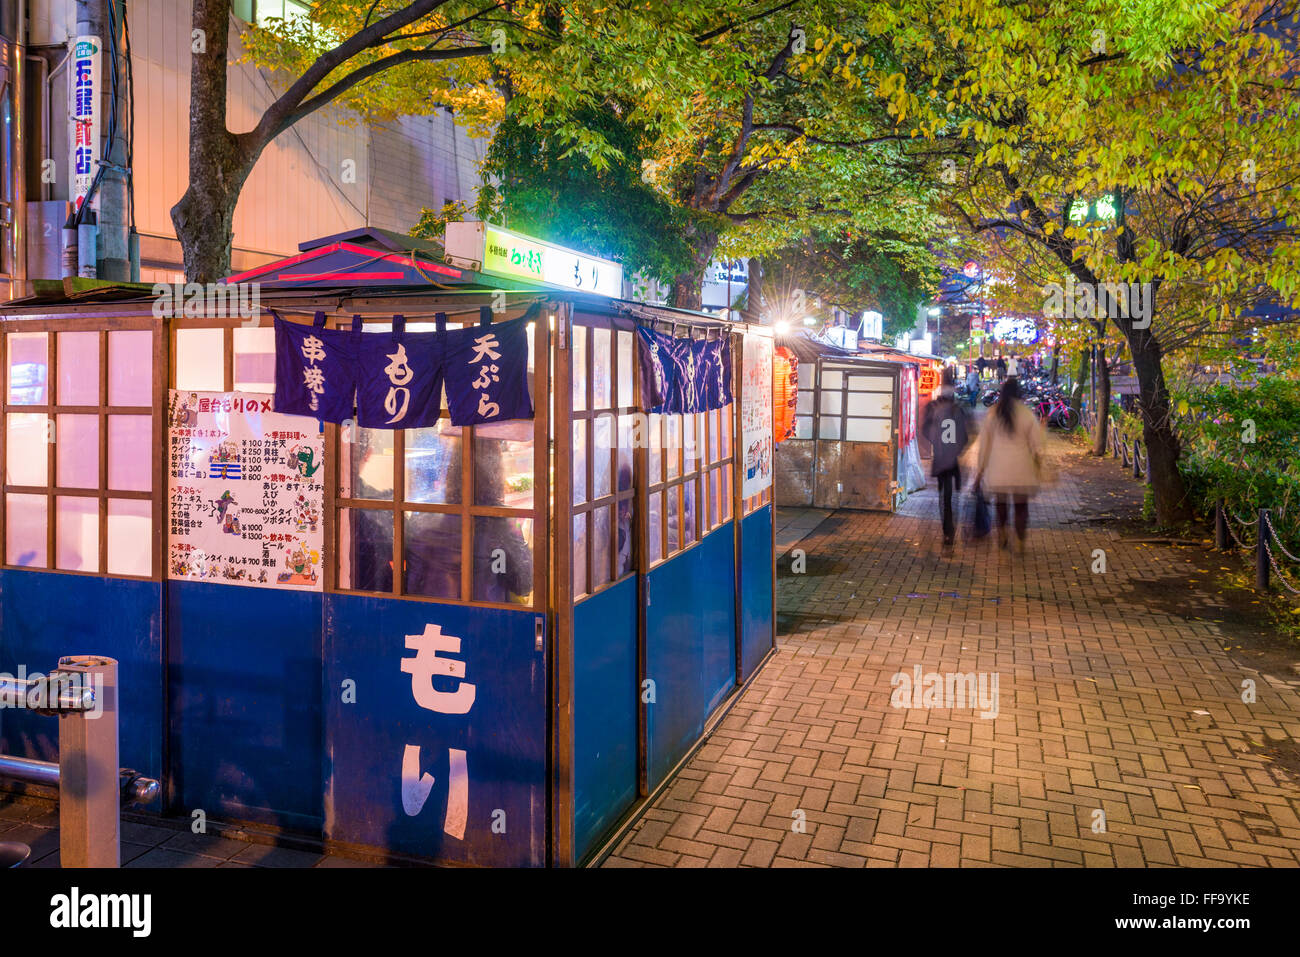 Fukuoka, Japan food stalls. - Stock Image